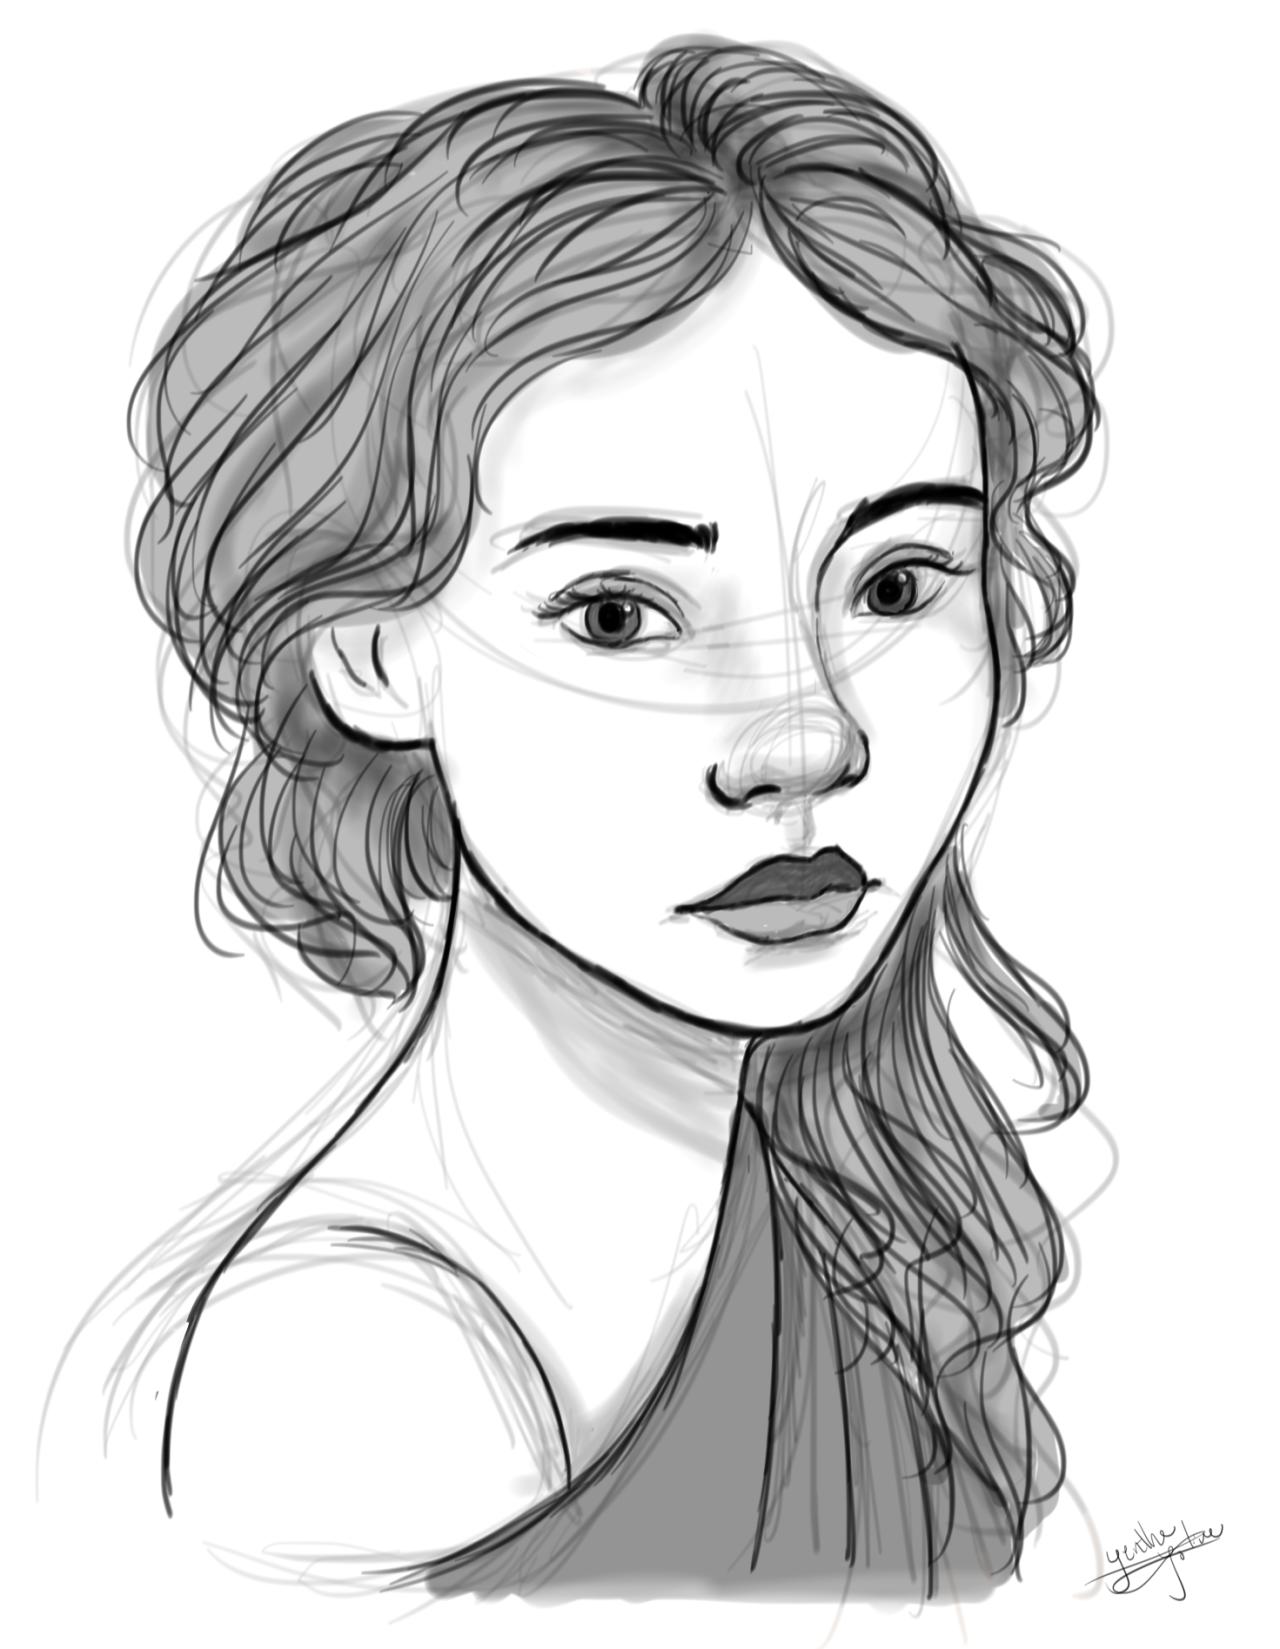 1280x1649 Yenthe Joline Art Quick Sketch In Sketchbook Pro With My New